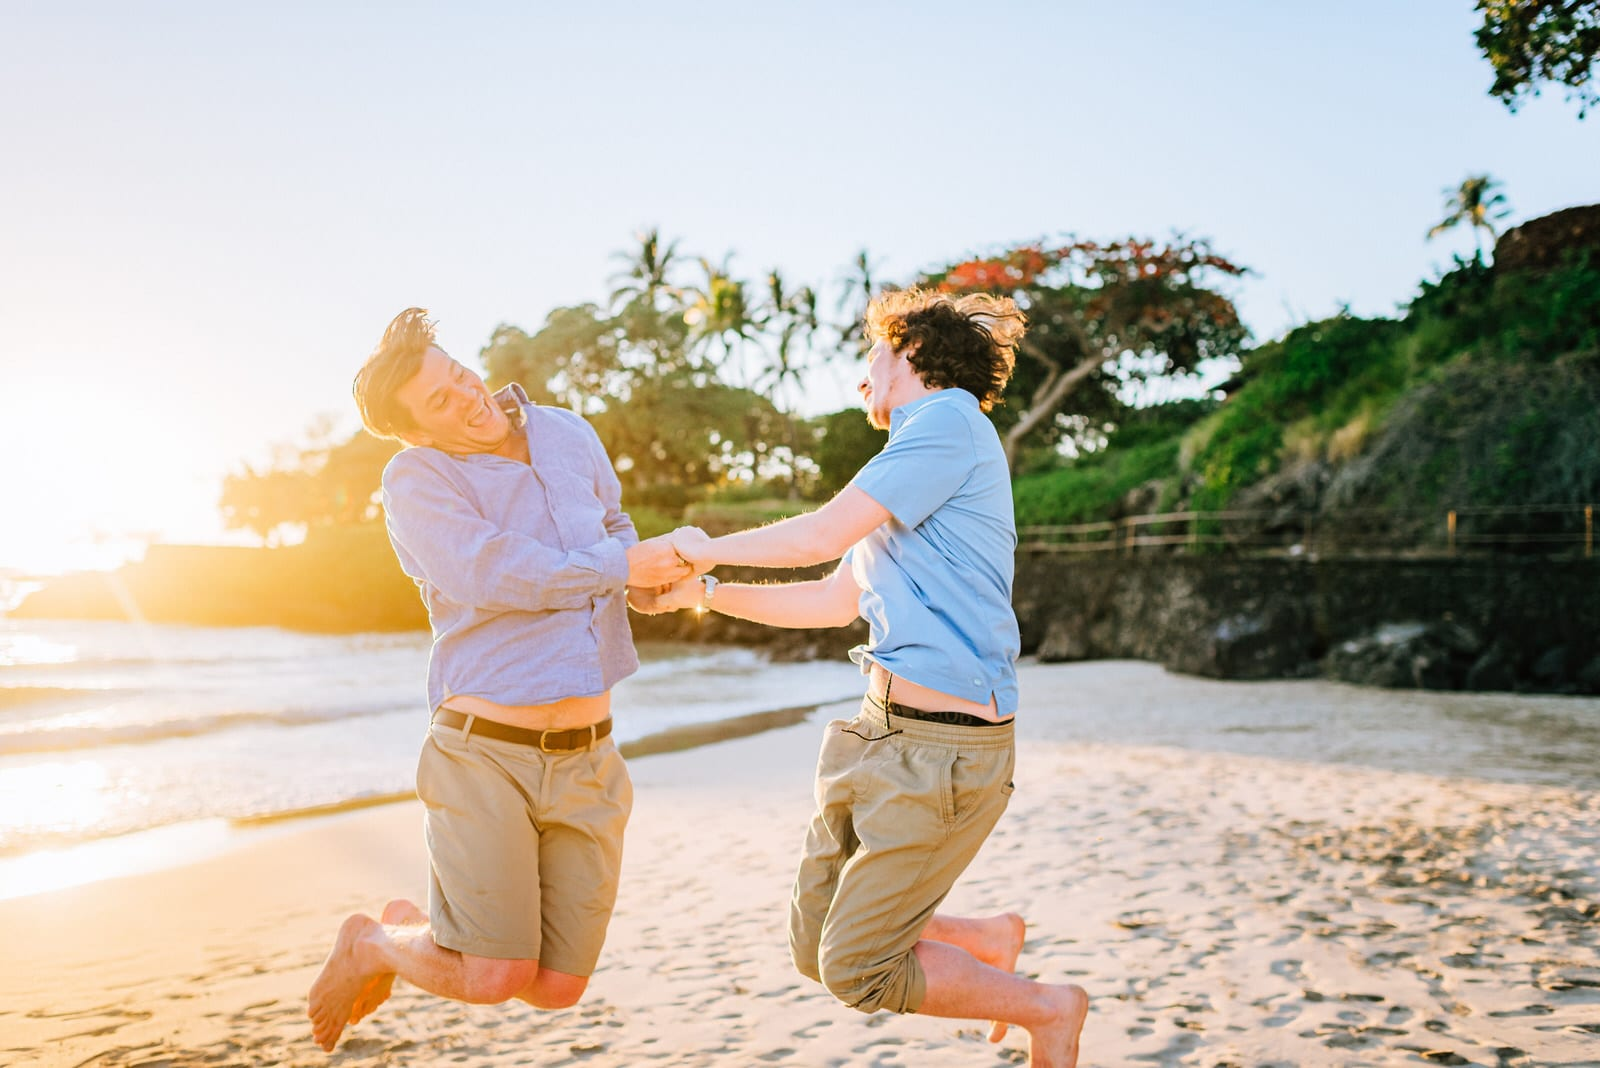 mauna-kea-hotel-photographers-hawaii-20.jpg